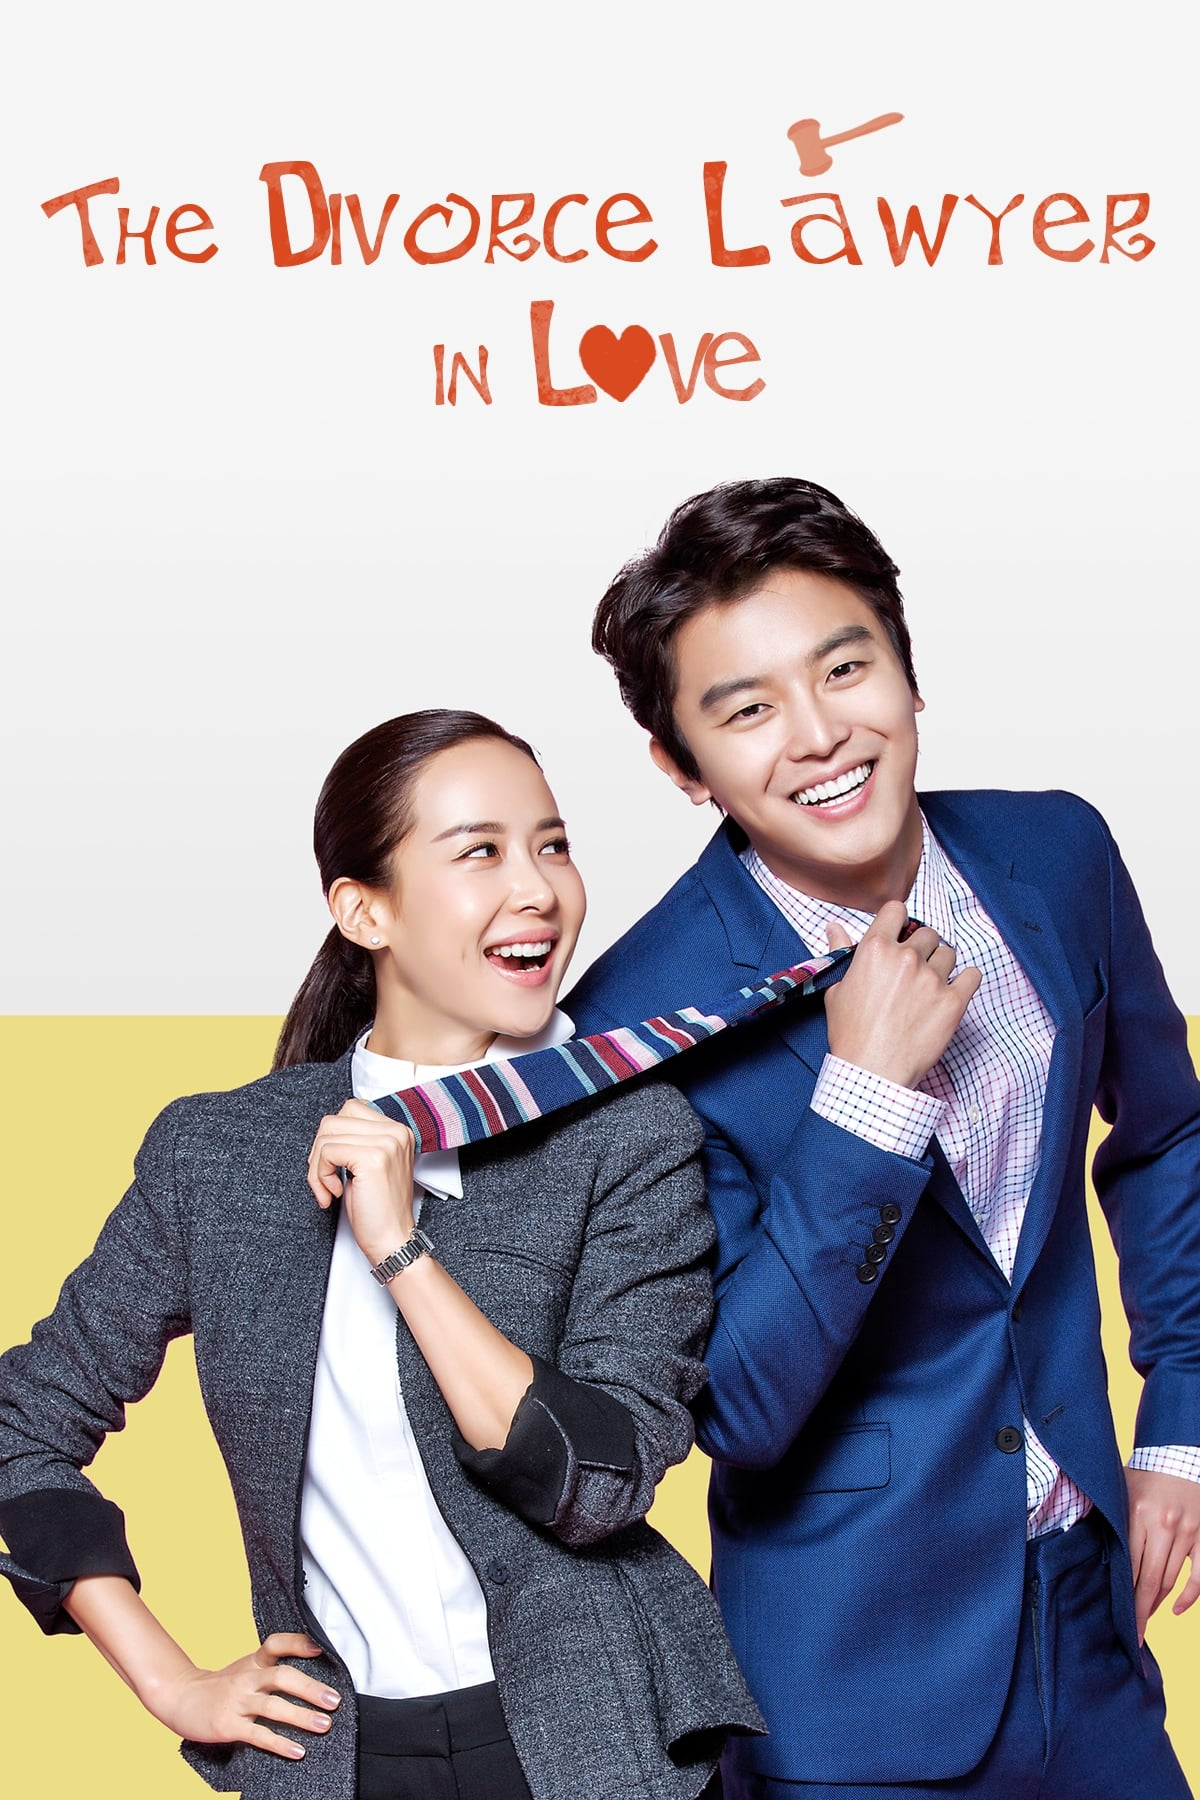 Divorce Lawyer in Love (2015)